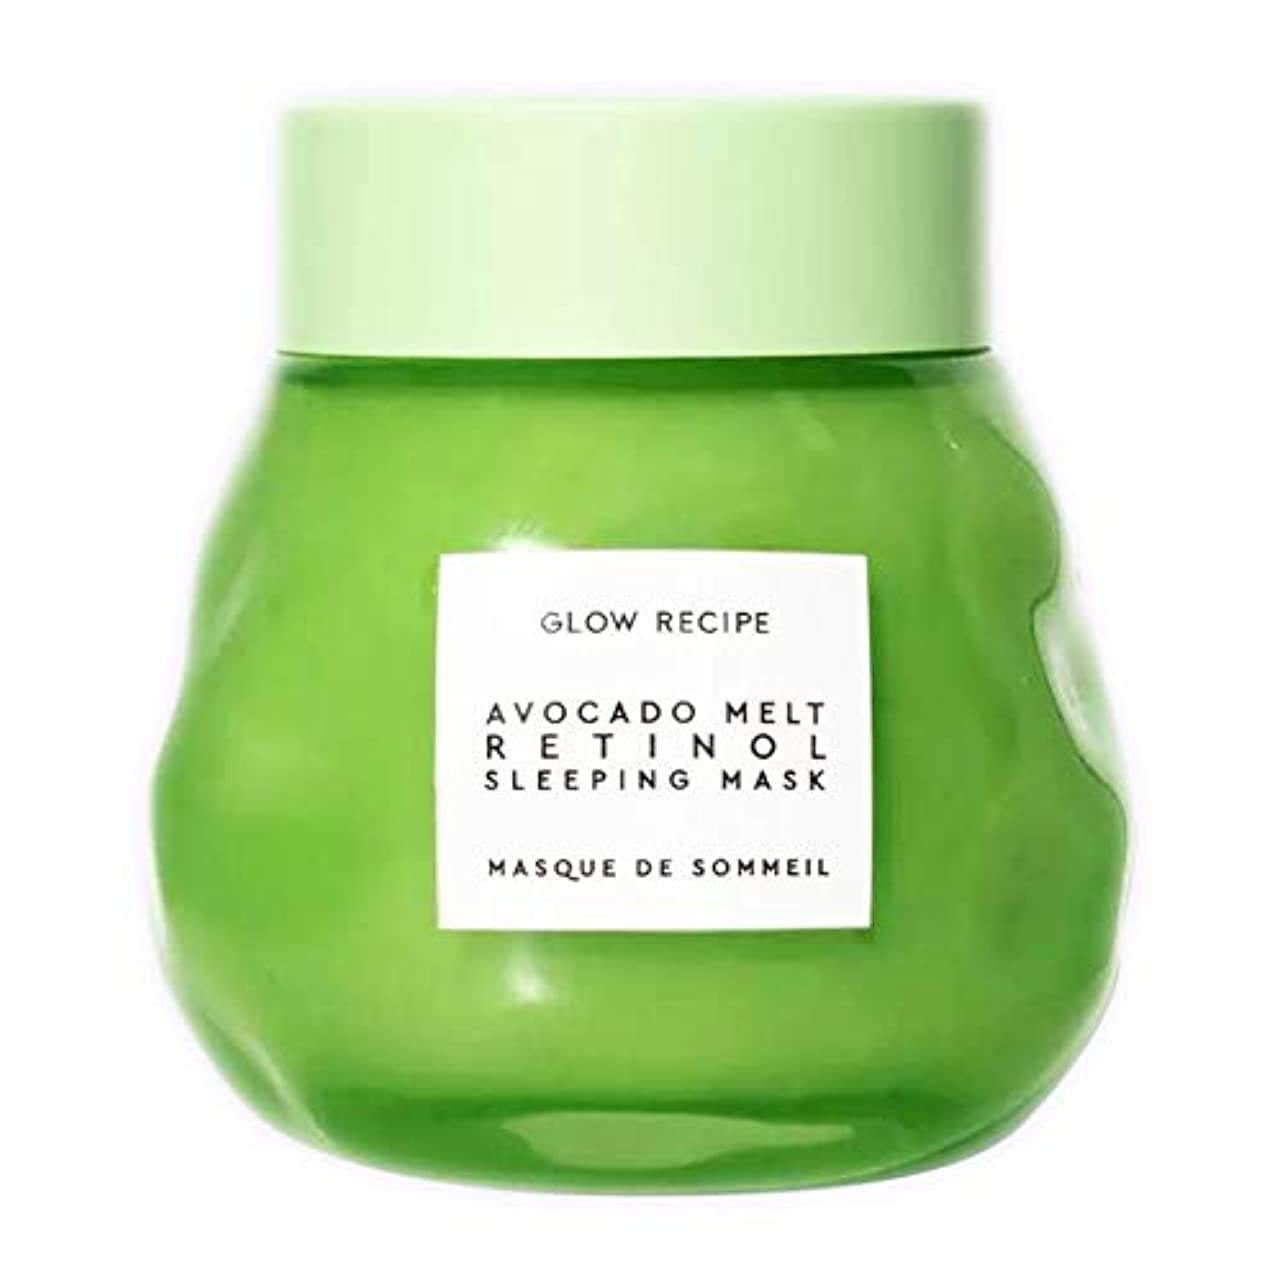 担当者噛む聖人Glow Recipe Avocado Retinol Sleeping Mask 70ml